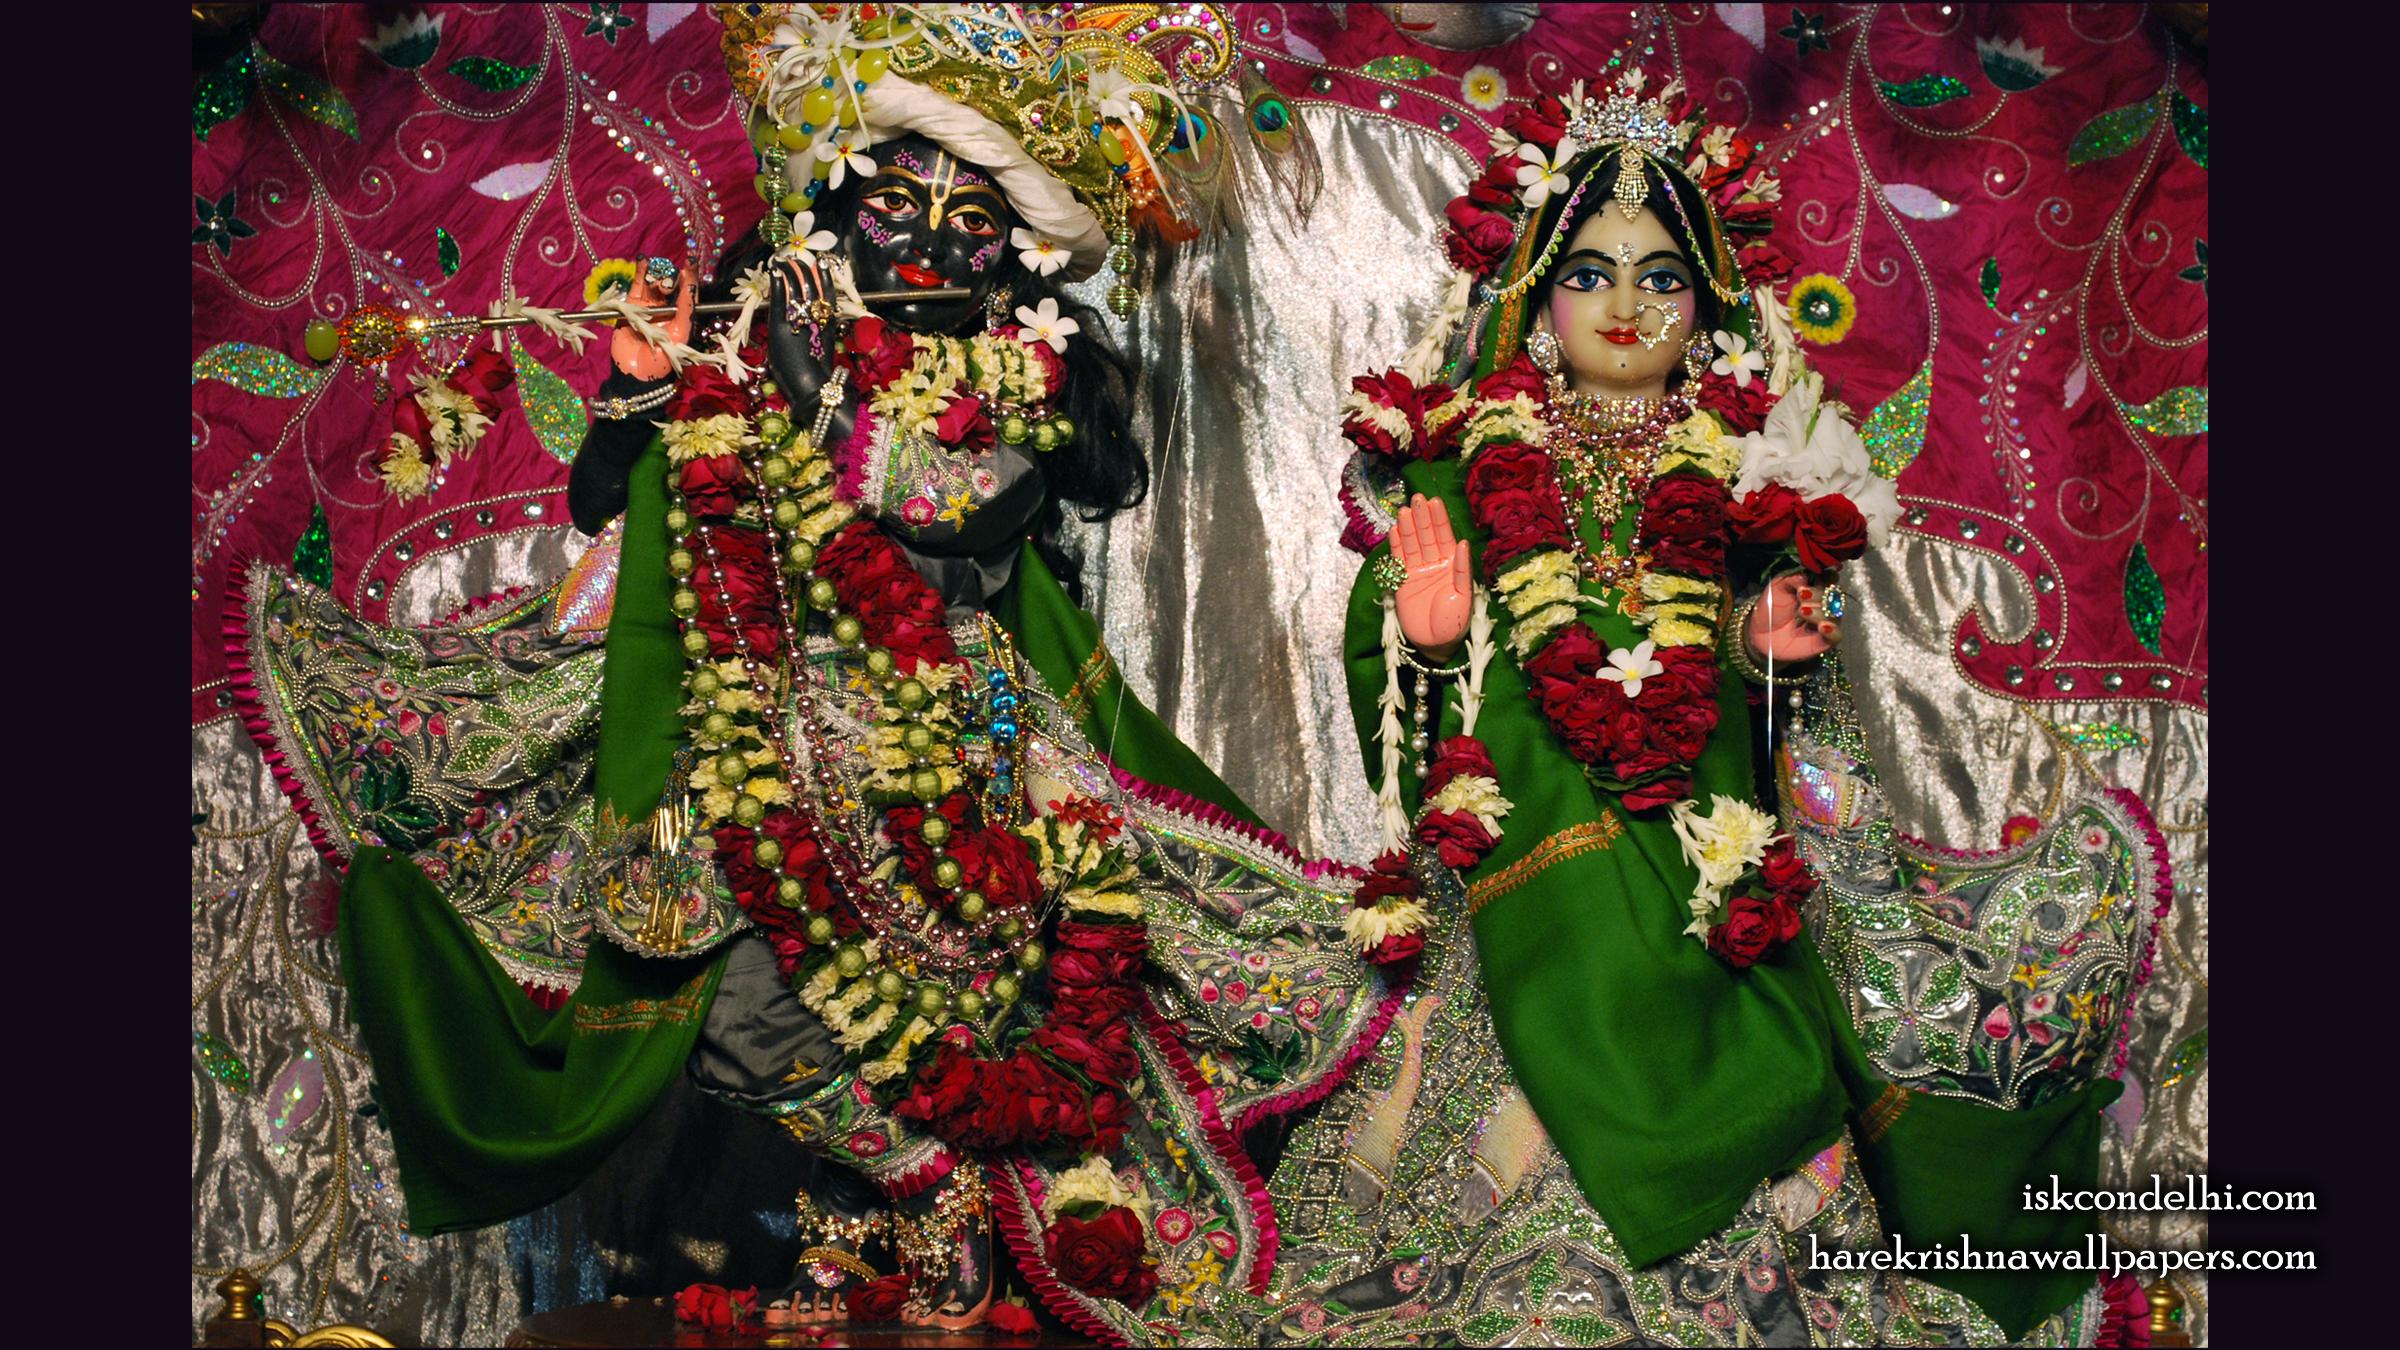 Sri Sri Radha Parthasarathi Wallpaper (006) Size 2400x1350 Download